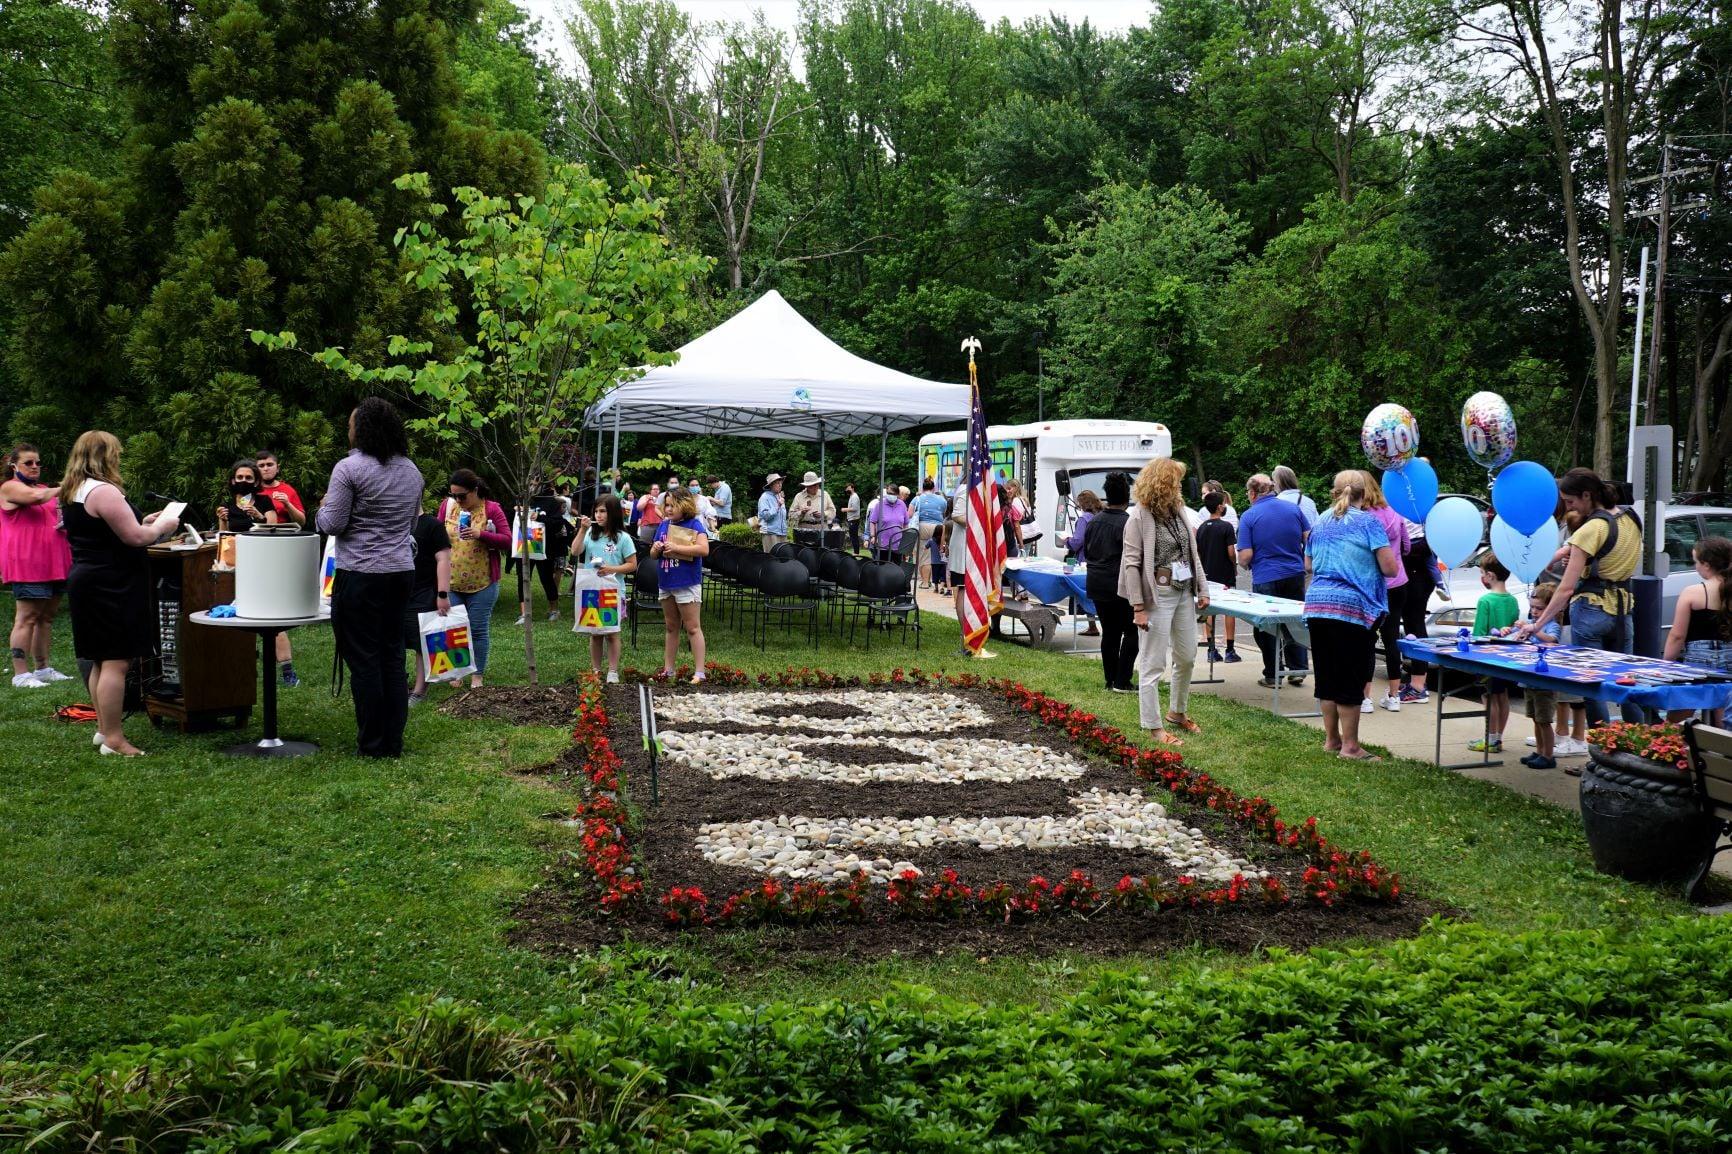 100th anniversary outdoor celebration